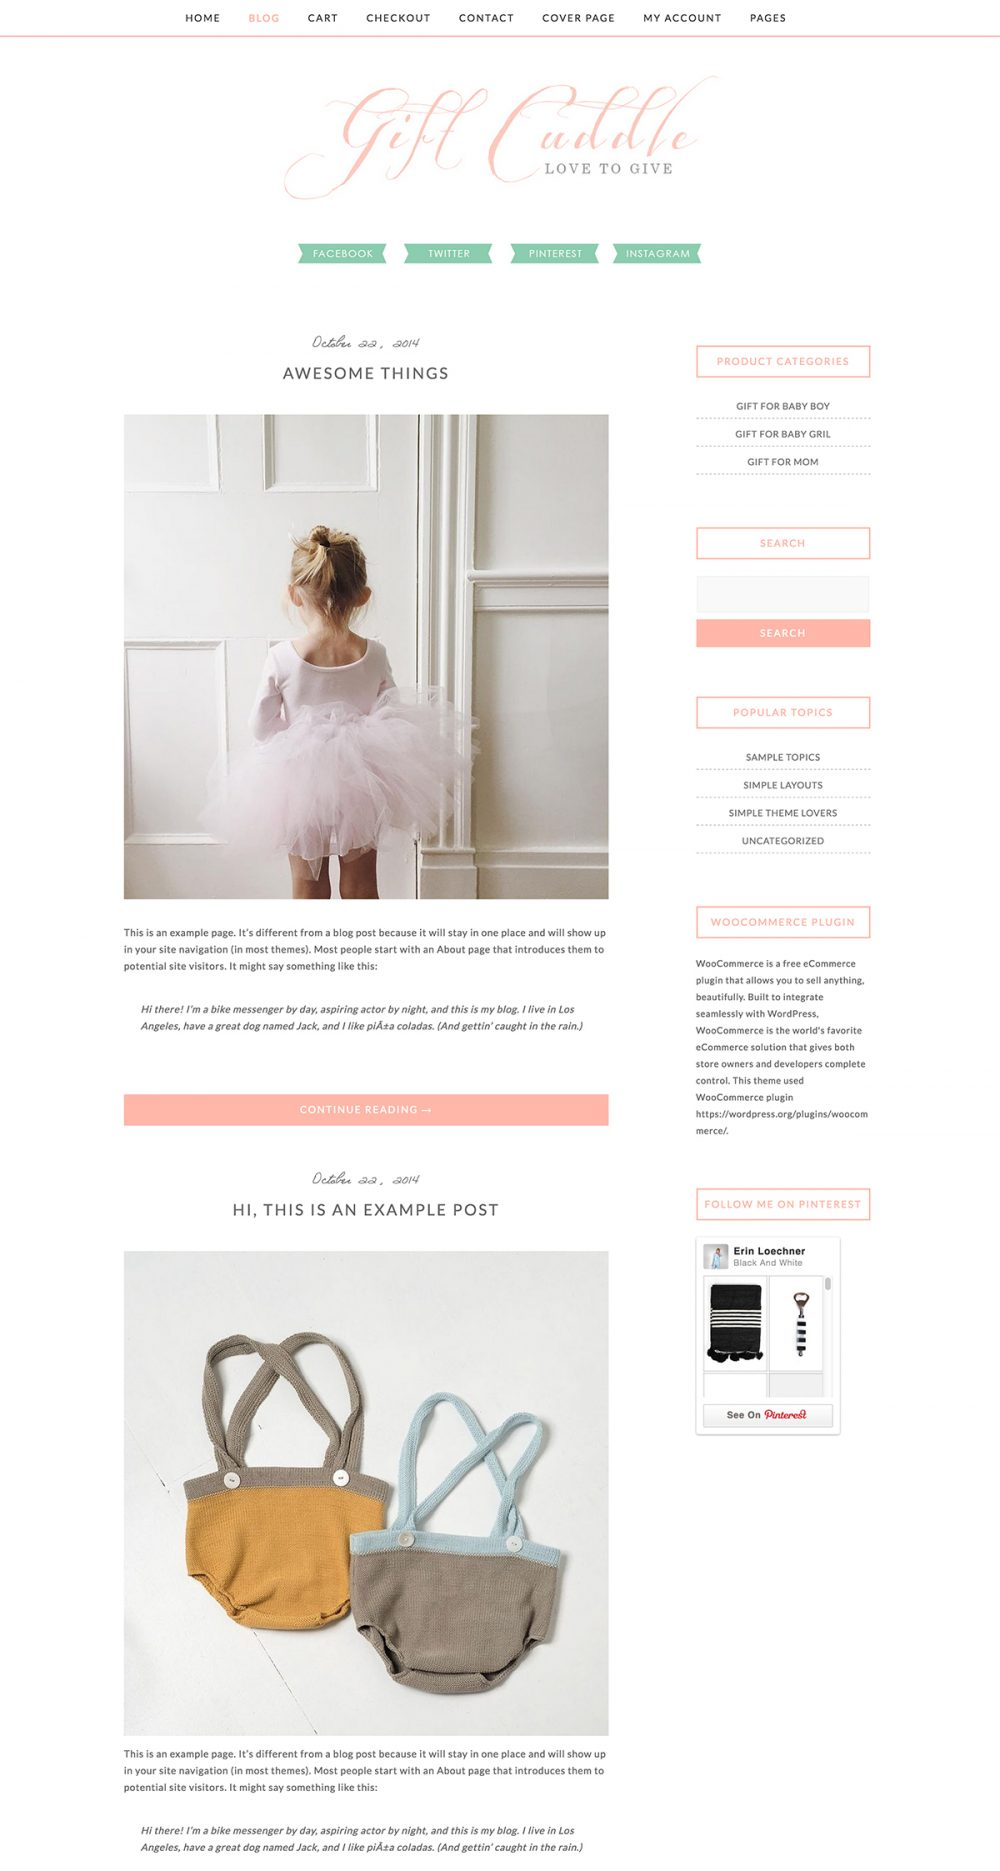 responsive wordpress theme blog template website design creative portfolio wordpress. Black Bedroom Furniture Sets. Home Design Ideas